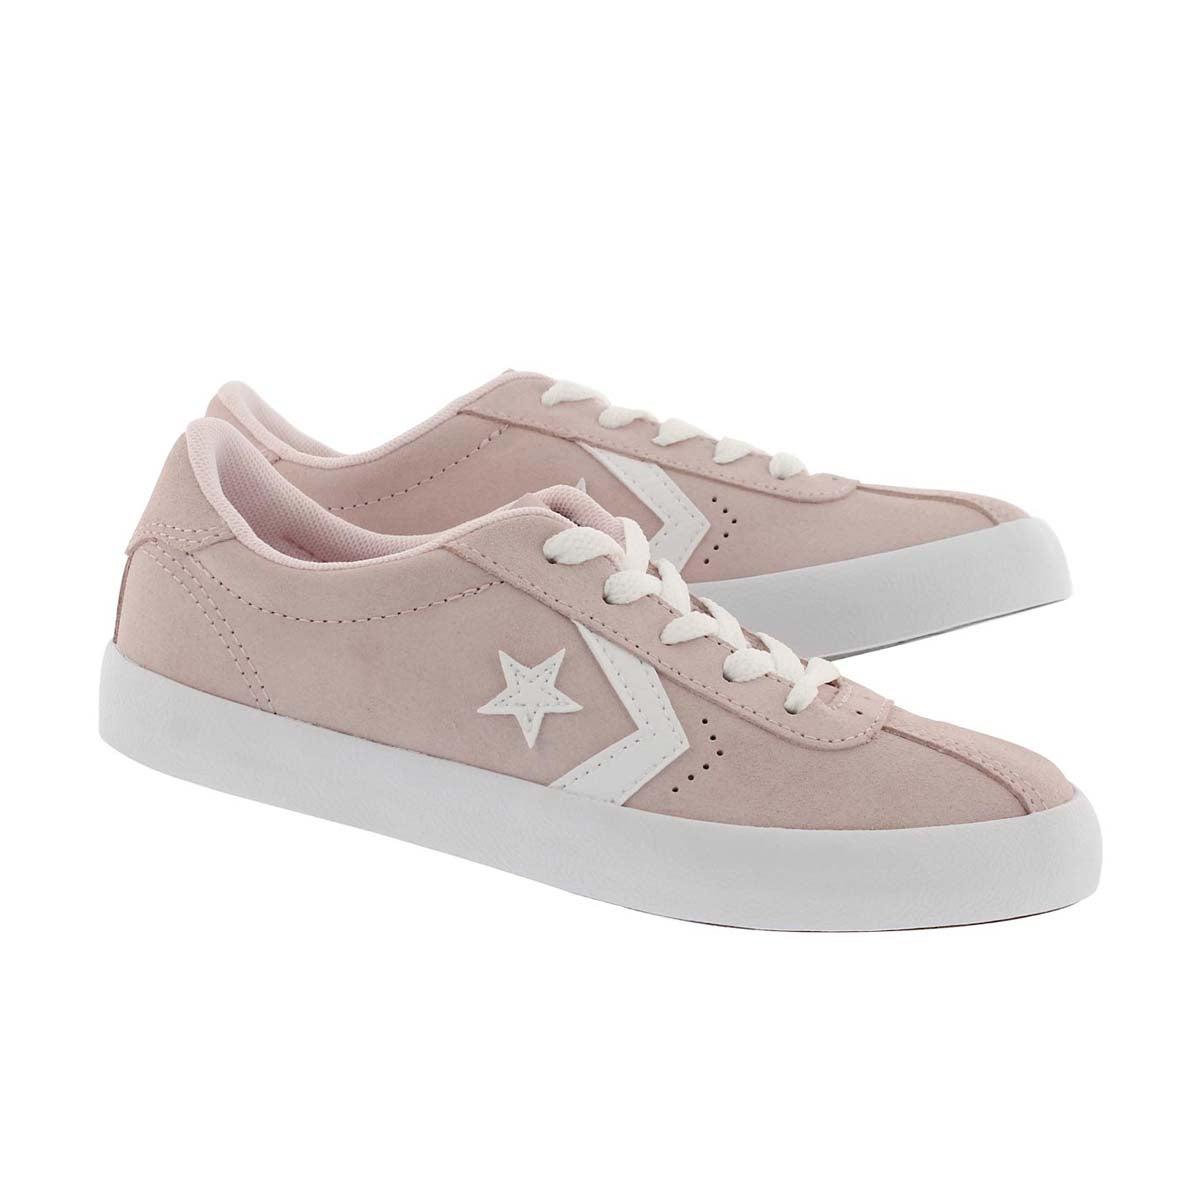 Grls Breakpoint arctic pink sneaker